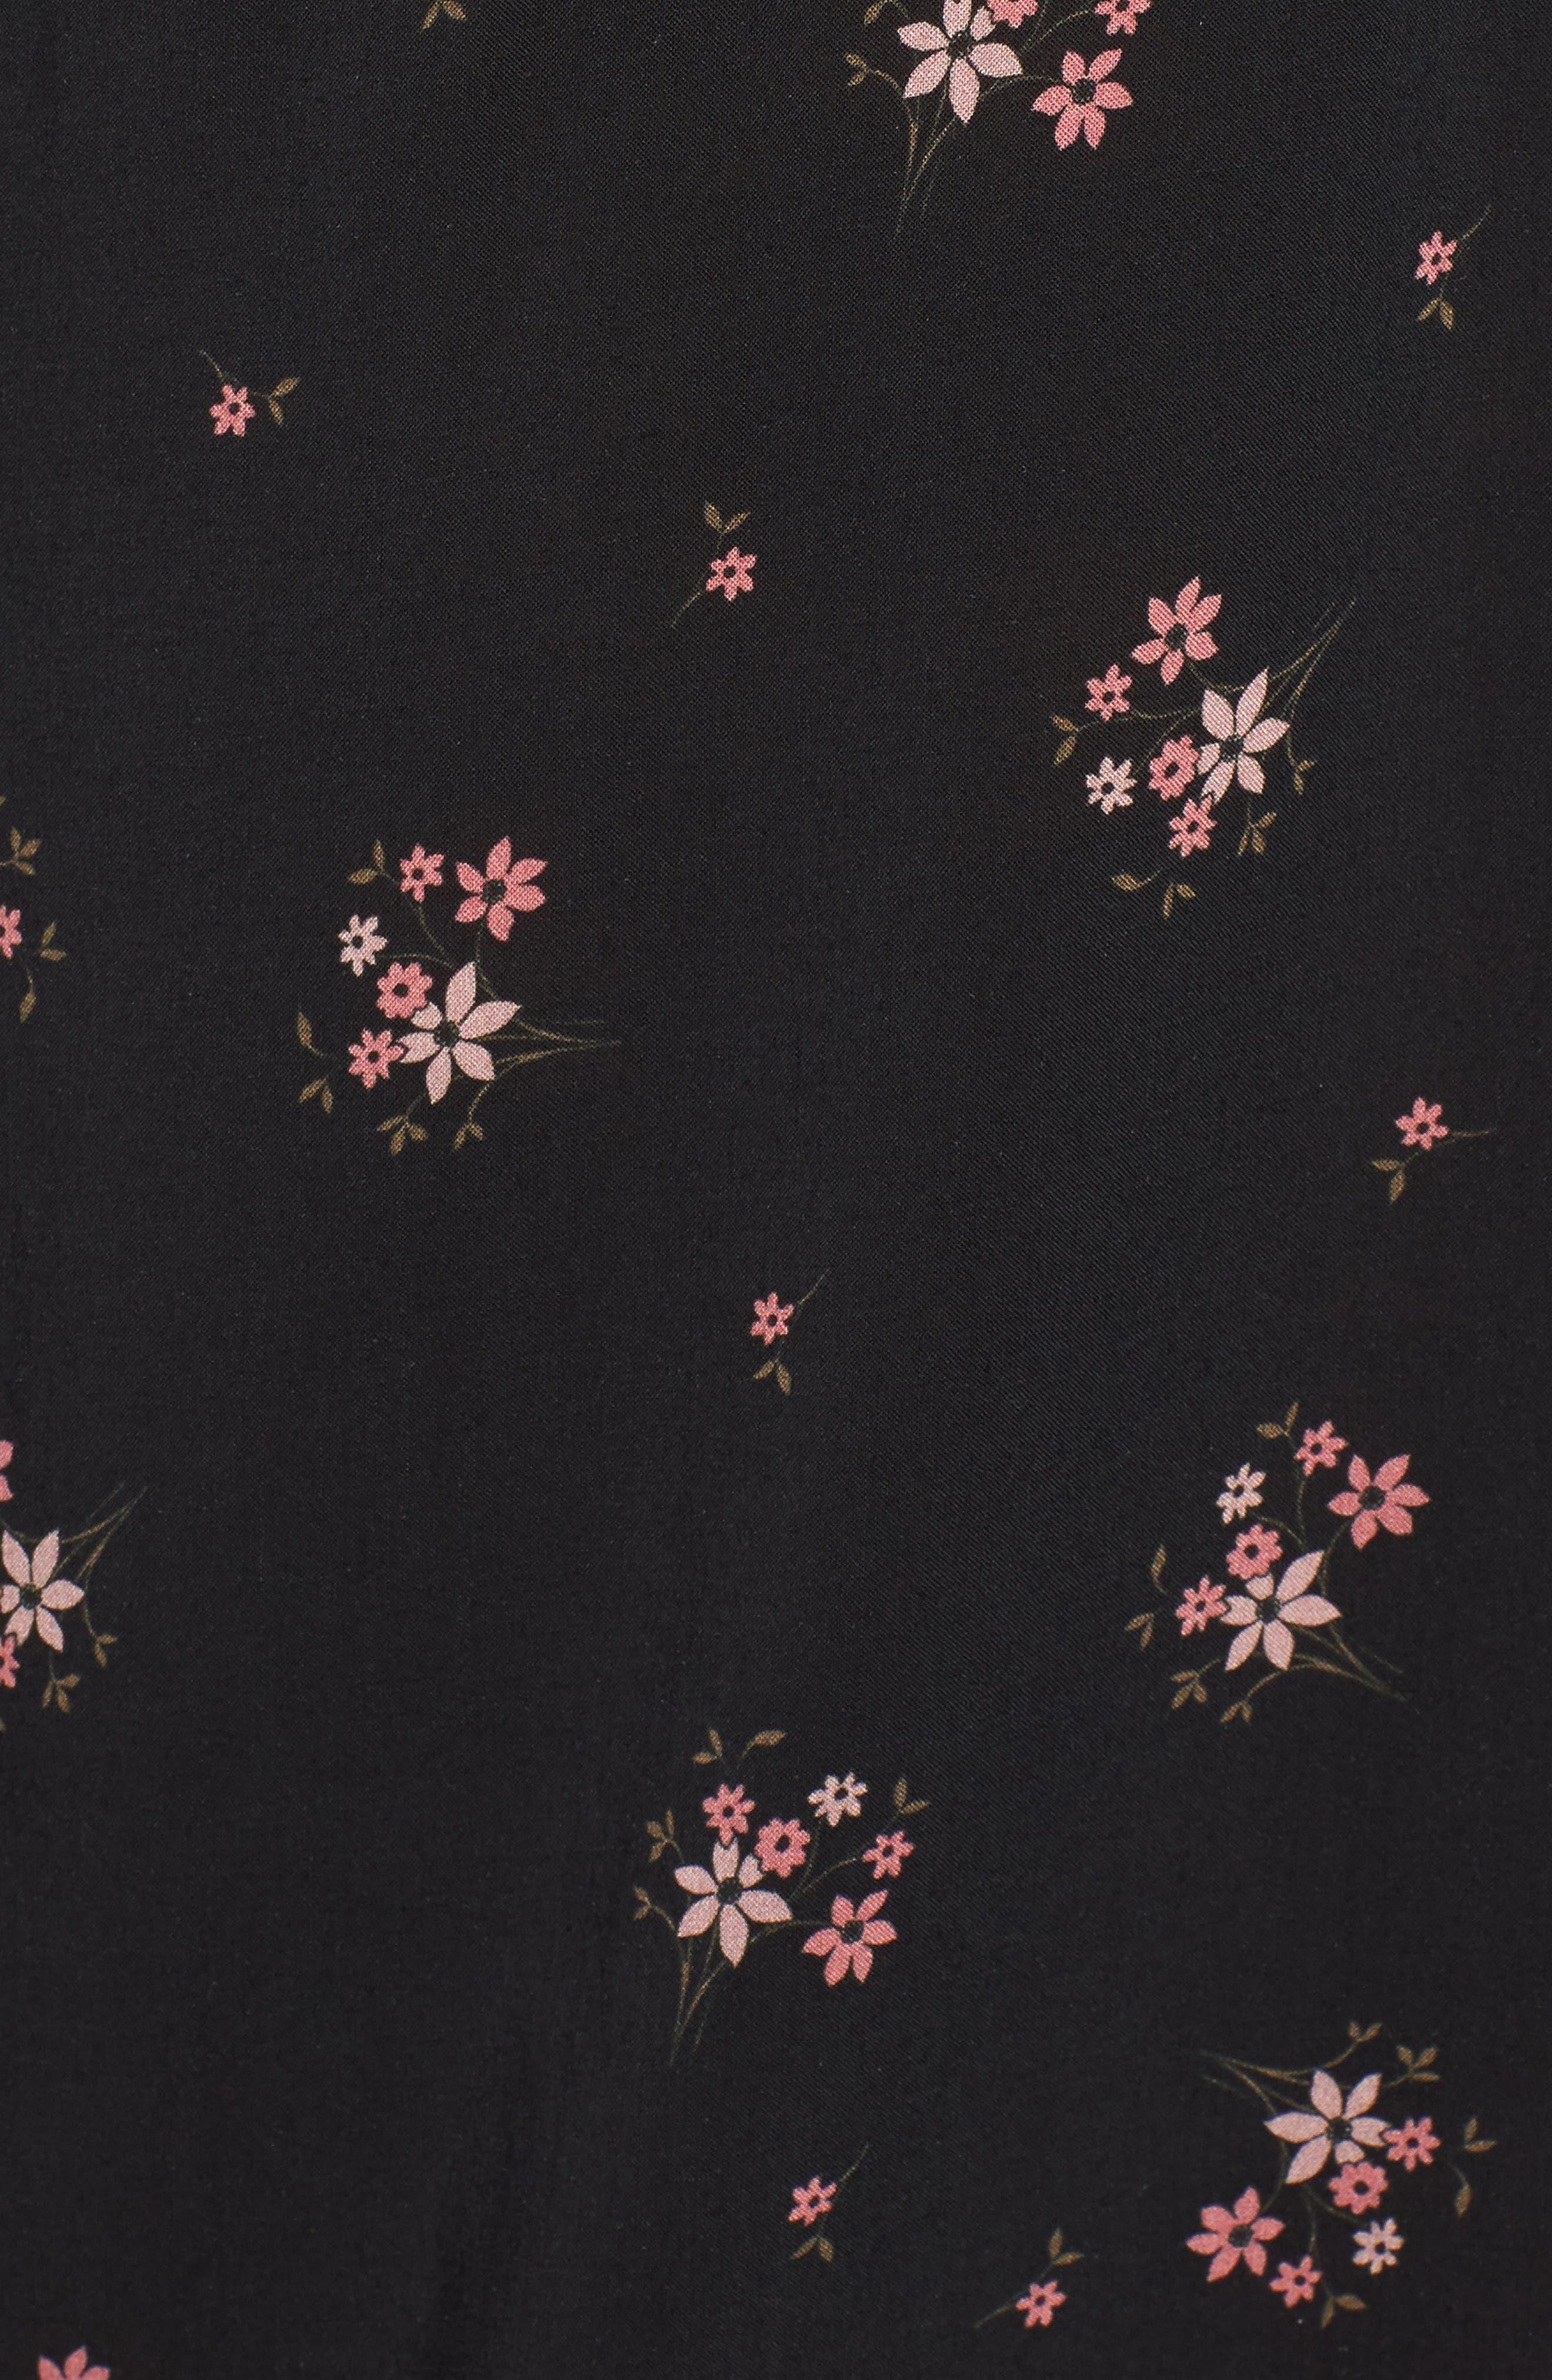 Floral Blouson Sleeve Dress,                             Alternate thumbnail 6, color,                             CAMELLIA